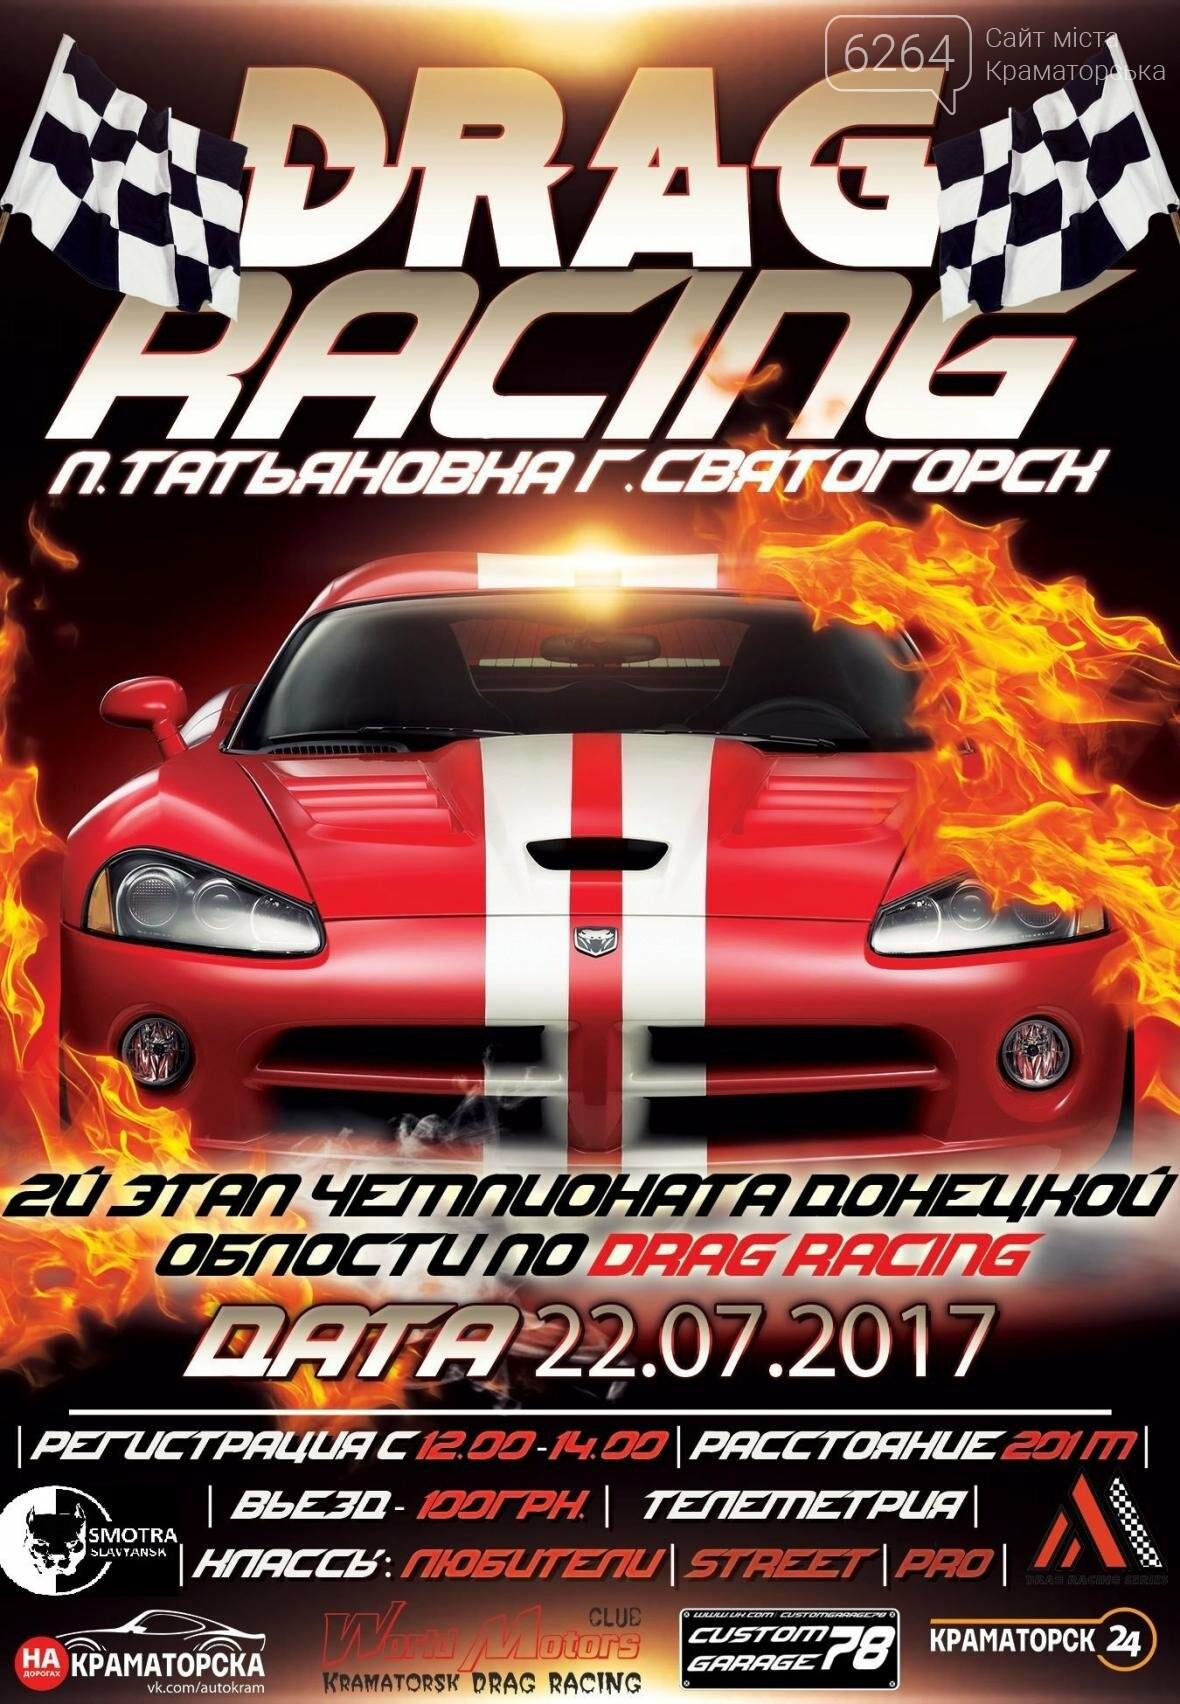 Краматорчан приглашают на чемпионат области по Drag Racing, фото-1